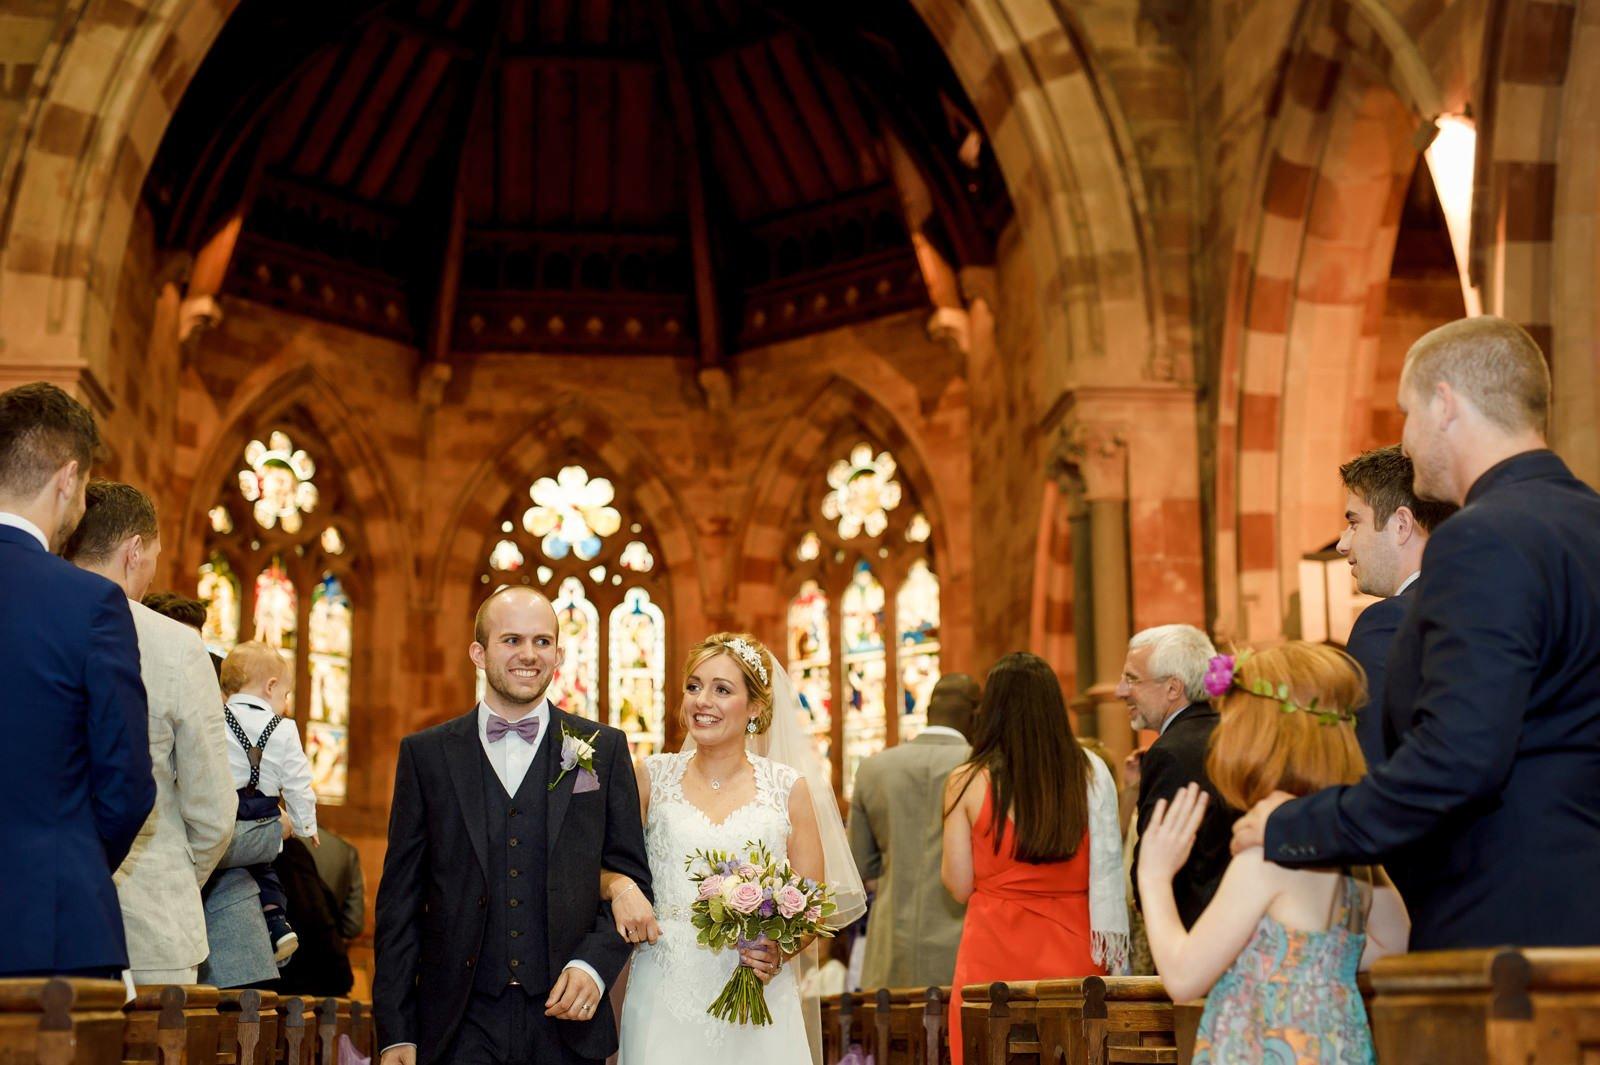 Millers Of Netley wedding, Dorrington, Shrewsbury | Emma + Ben 21